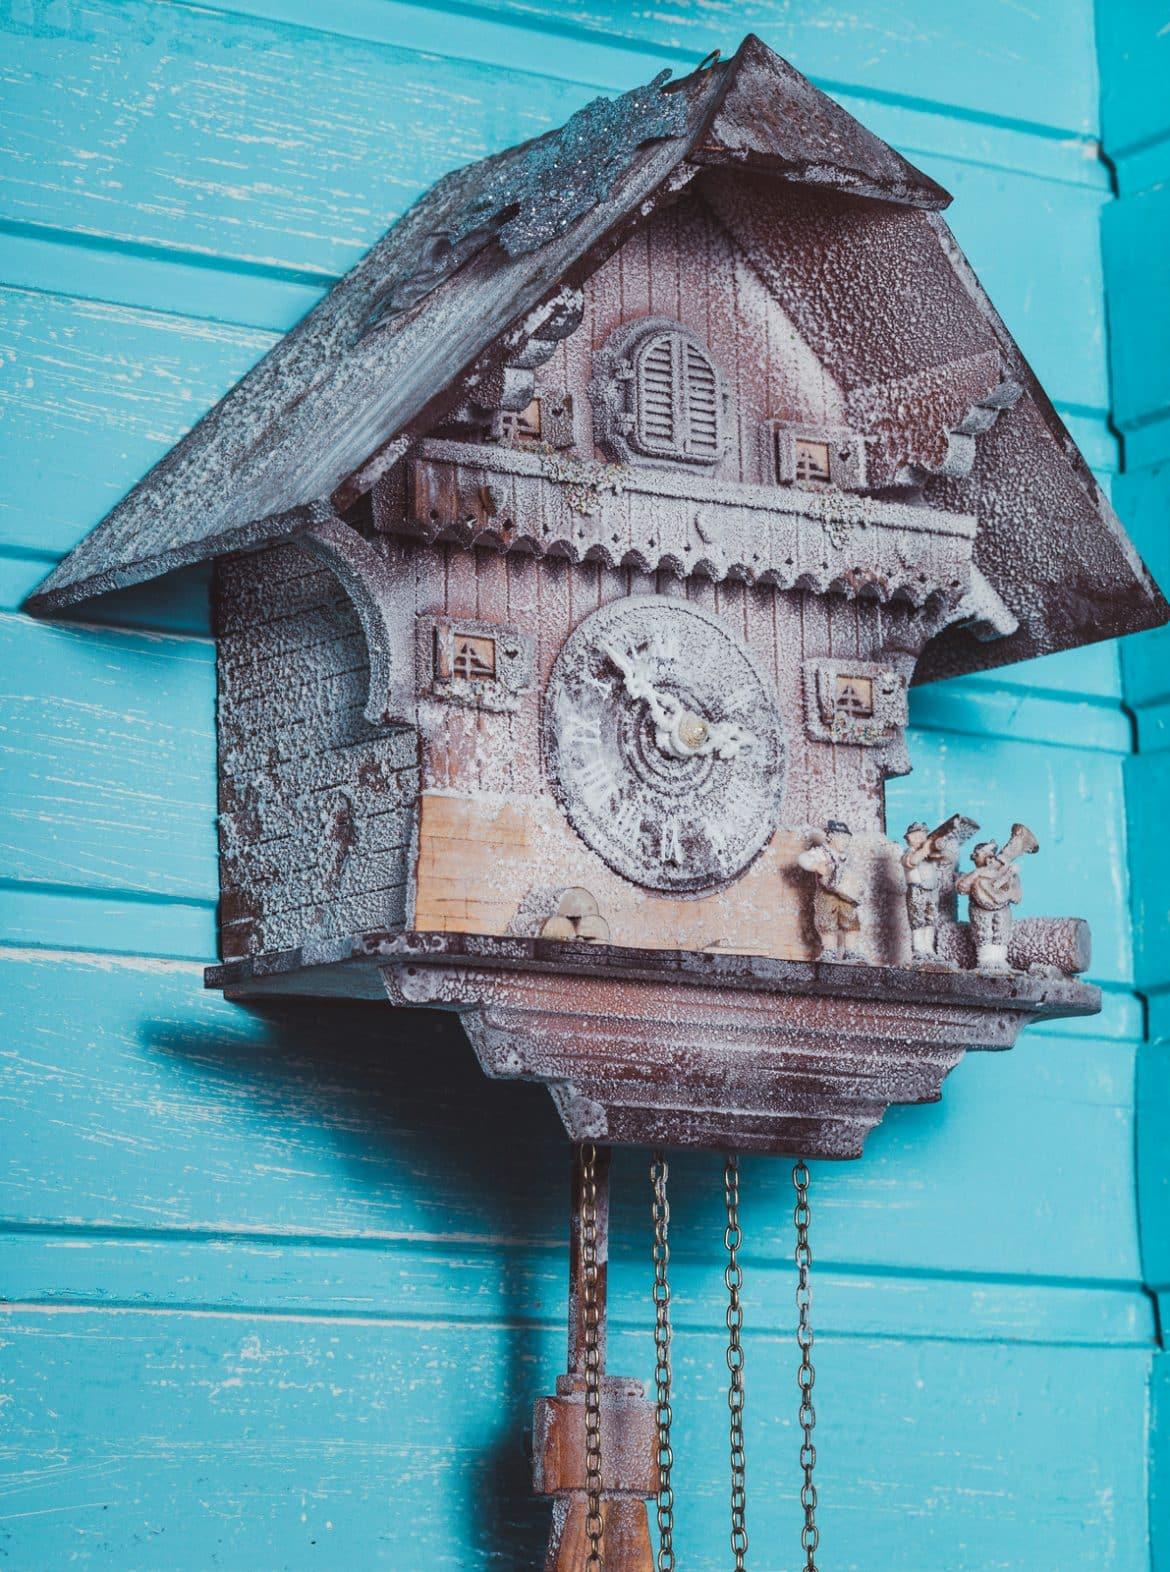 Antique Cuckoo Clocks